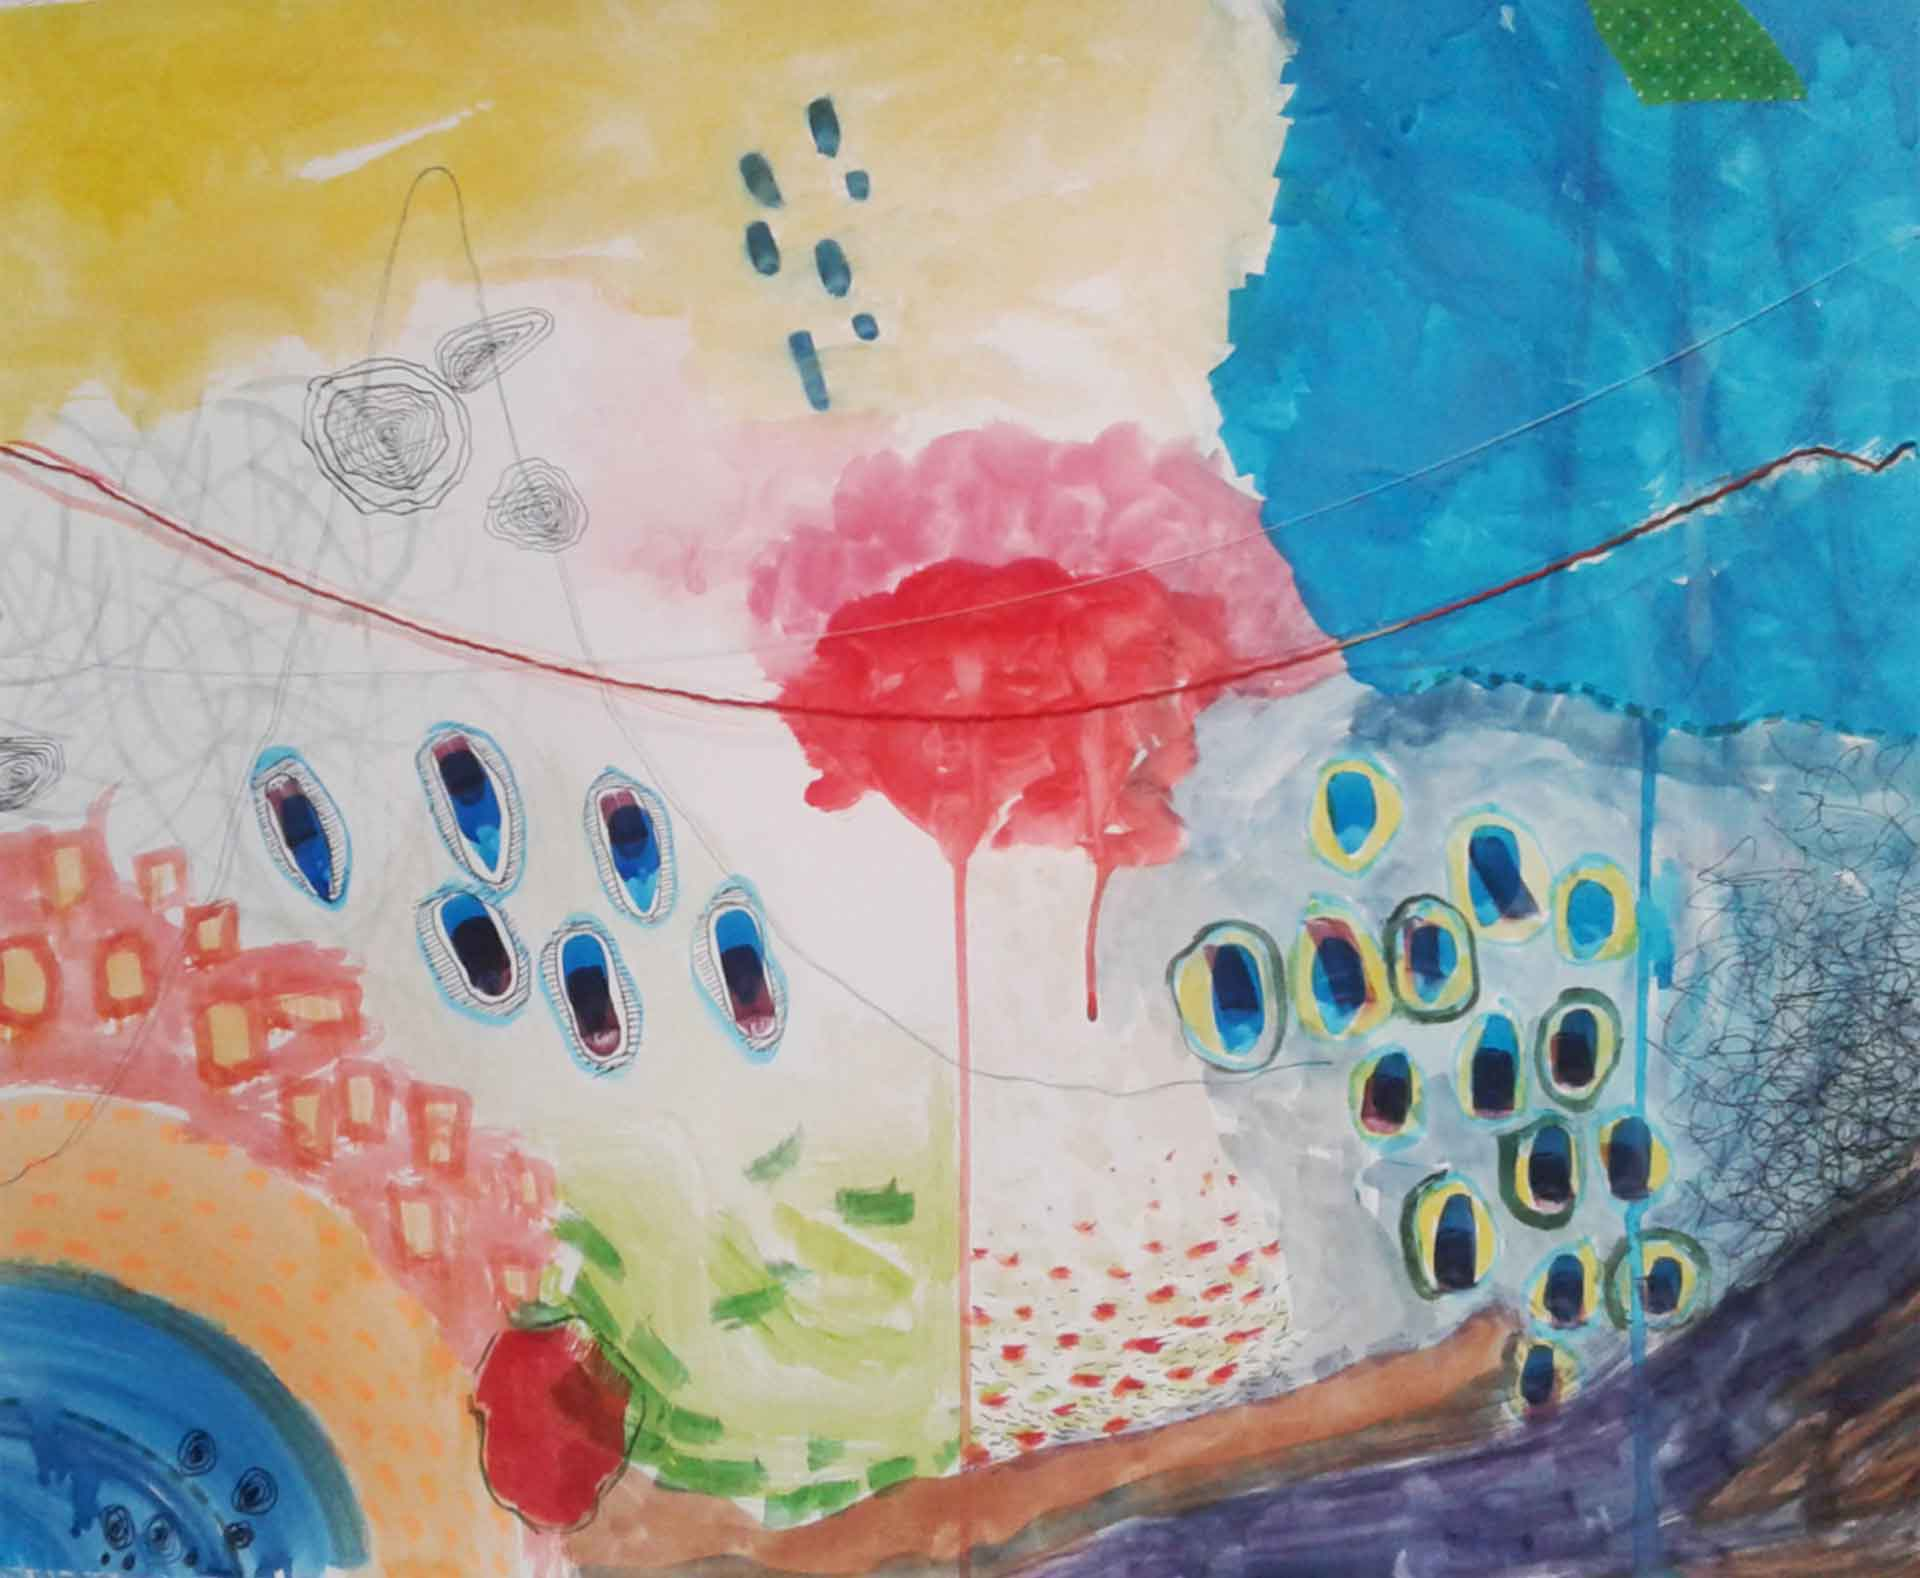 swati gupta Flux SwatiG arts and society